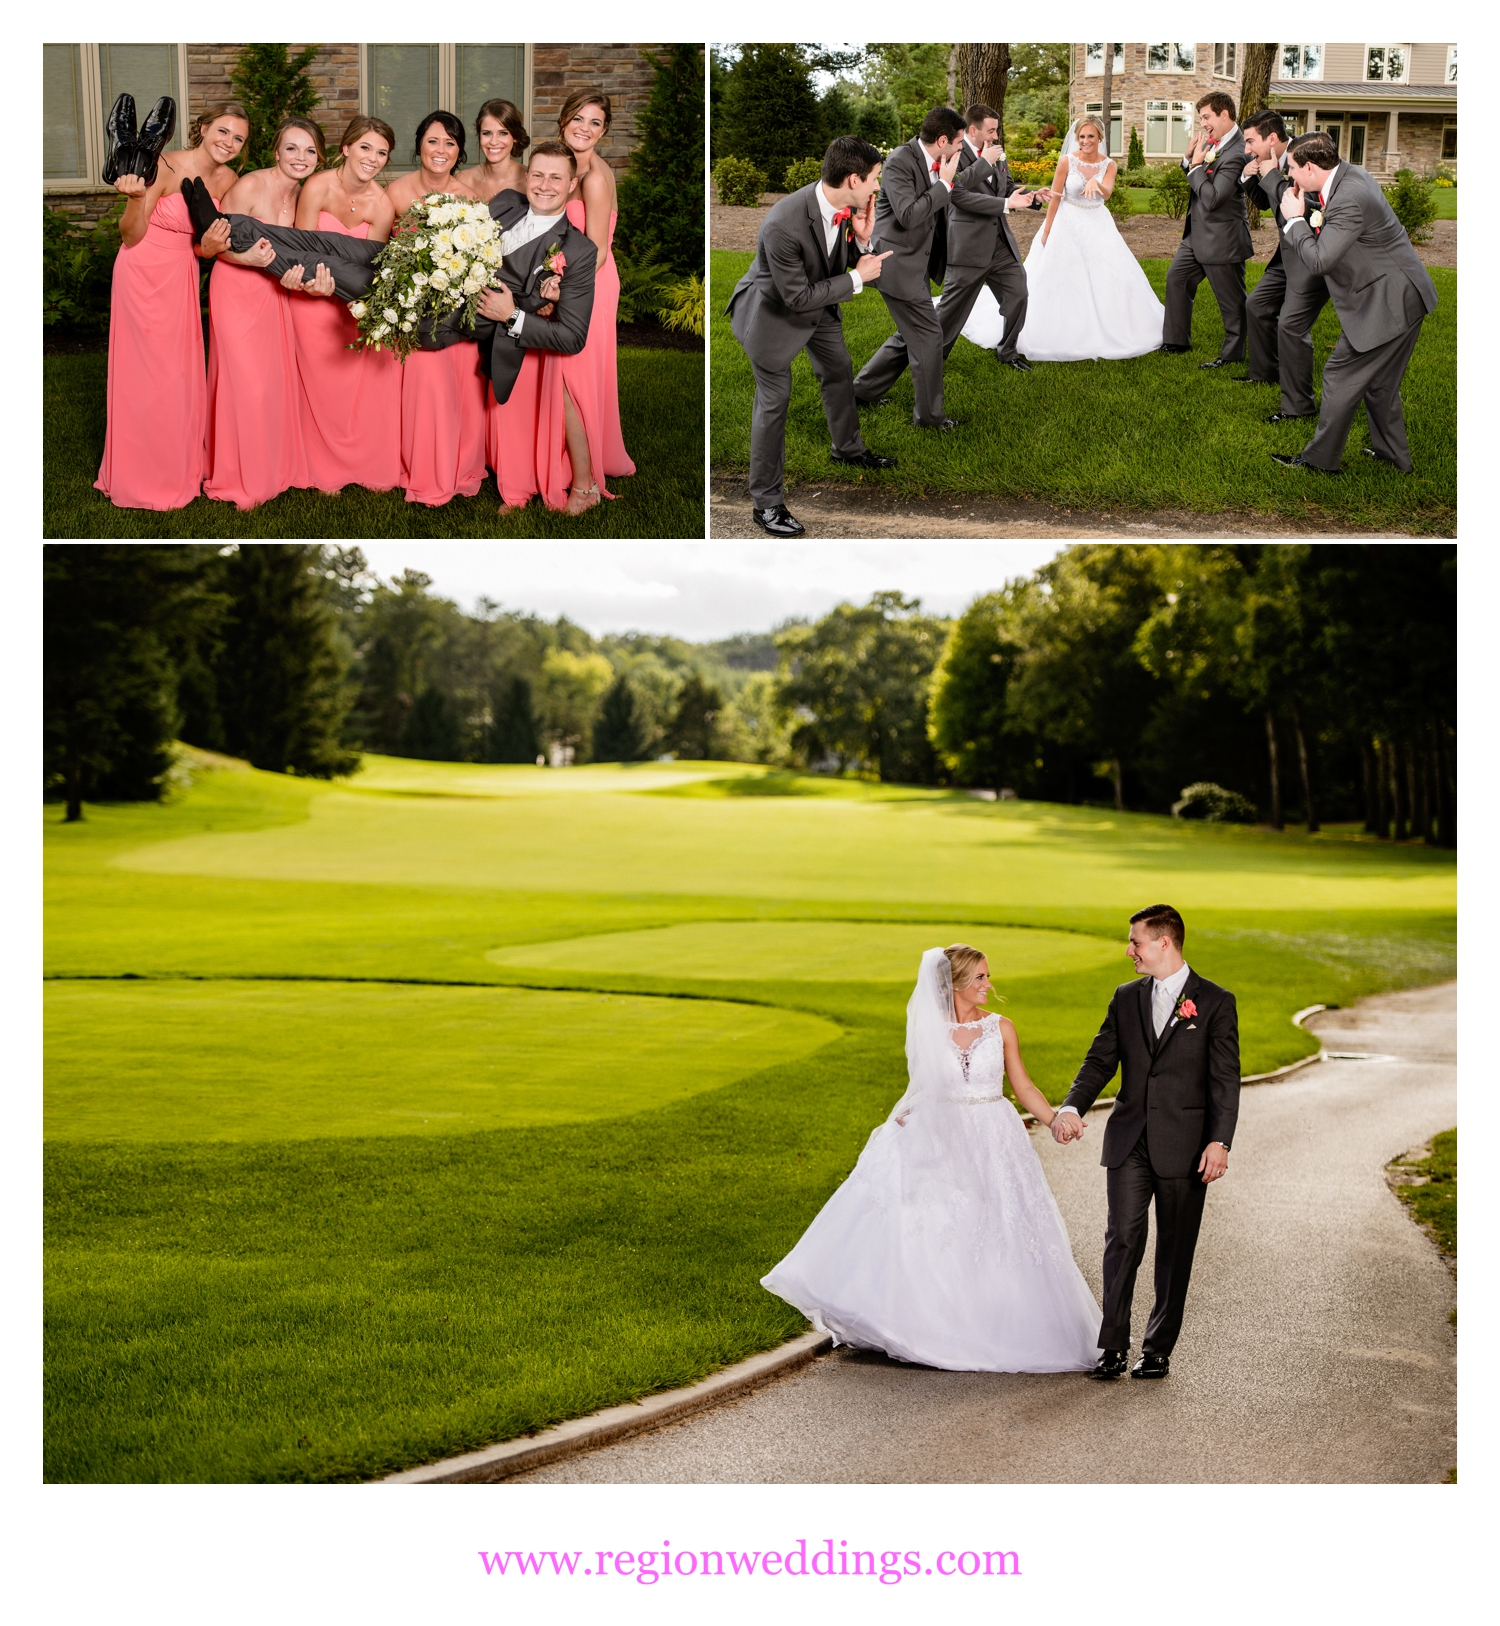 Wedding photo fun at Sandy Pines Golf Course.